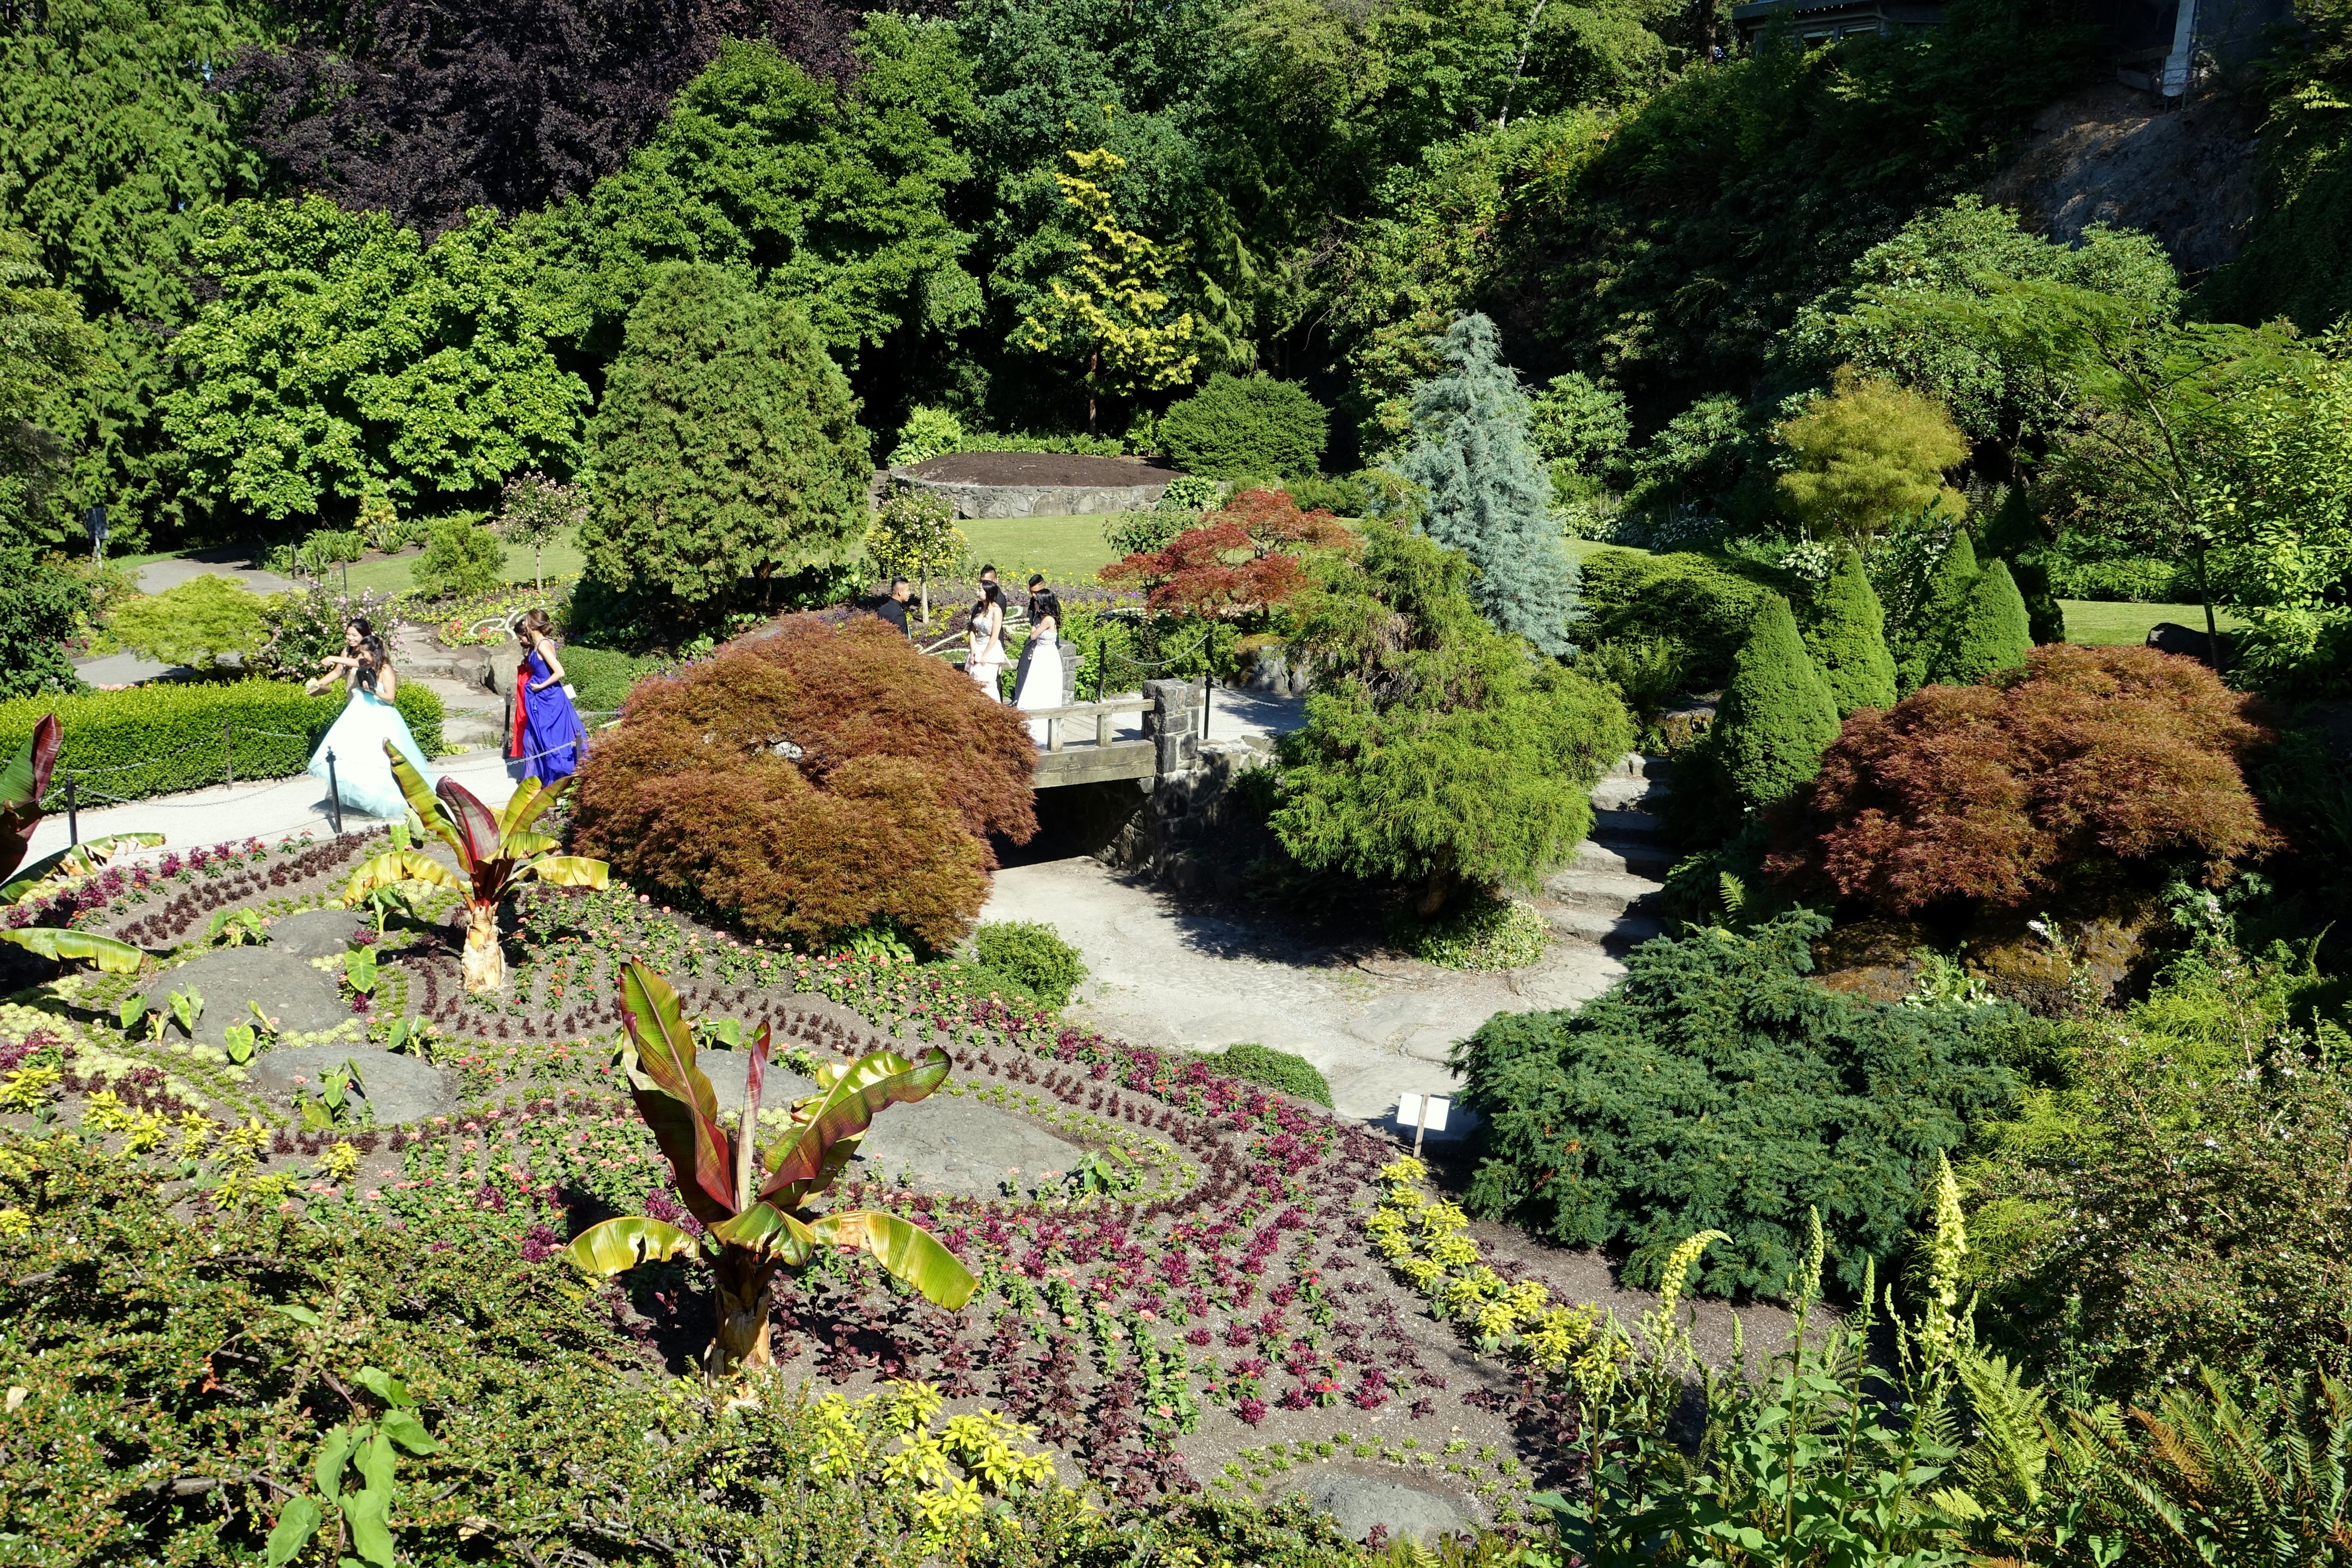 Small Quarry Garden - Queen Elizabeth Park - Vancouver, Canada - DSC07590.JPG